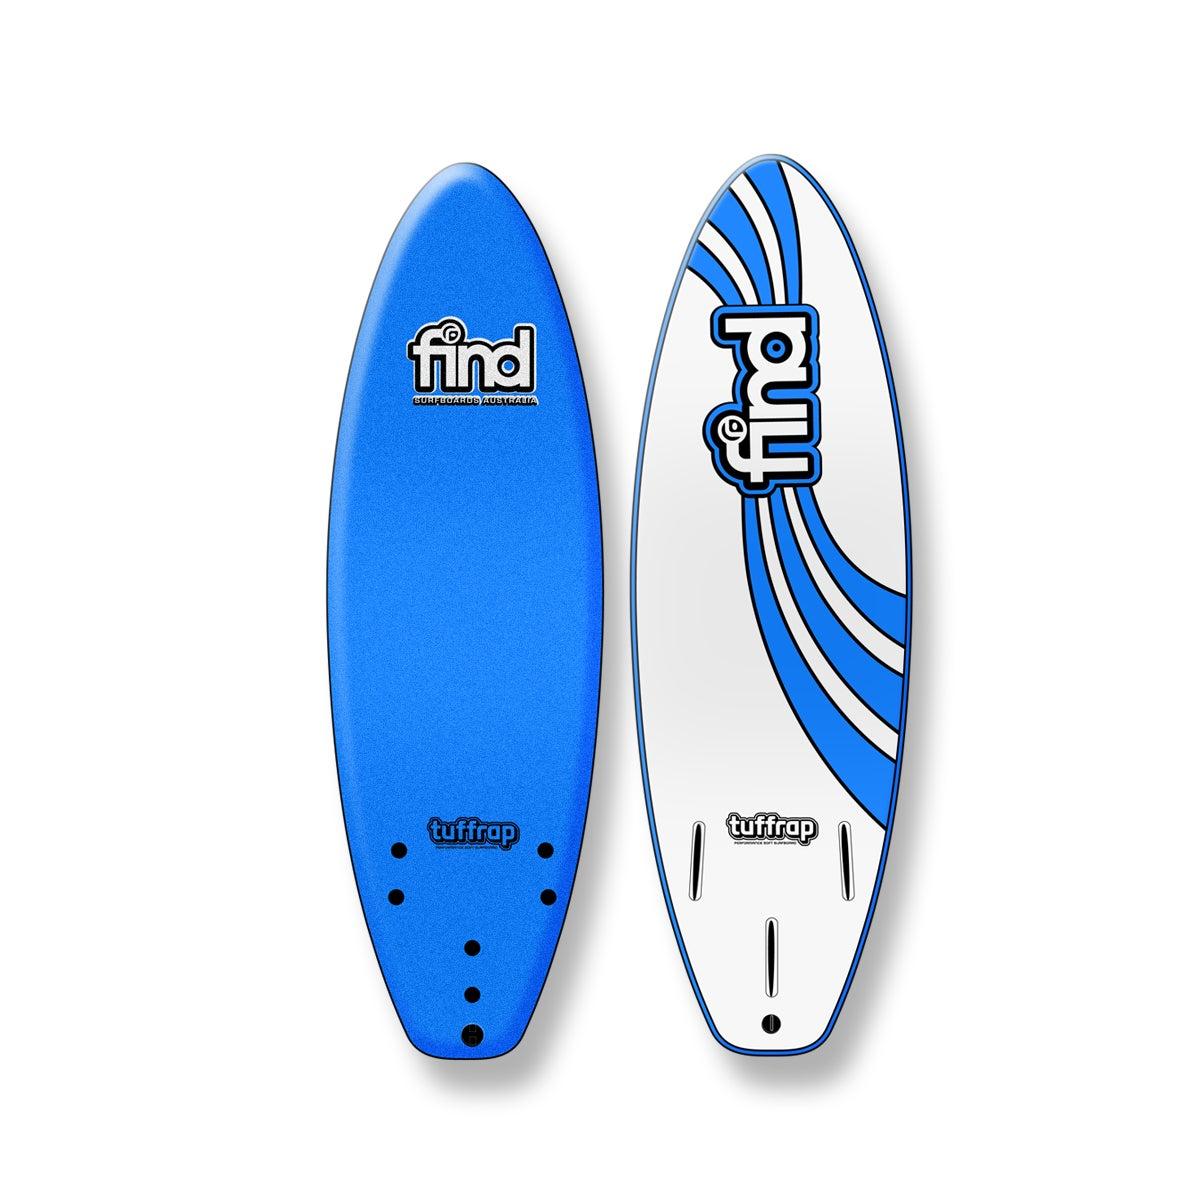 FIND™ Tuffrap Thruster Soft Surfboard Blue